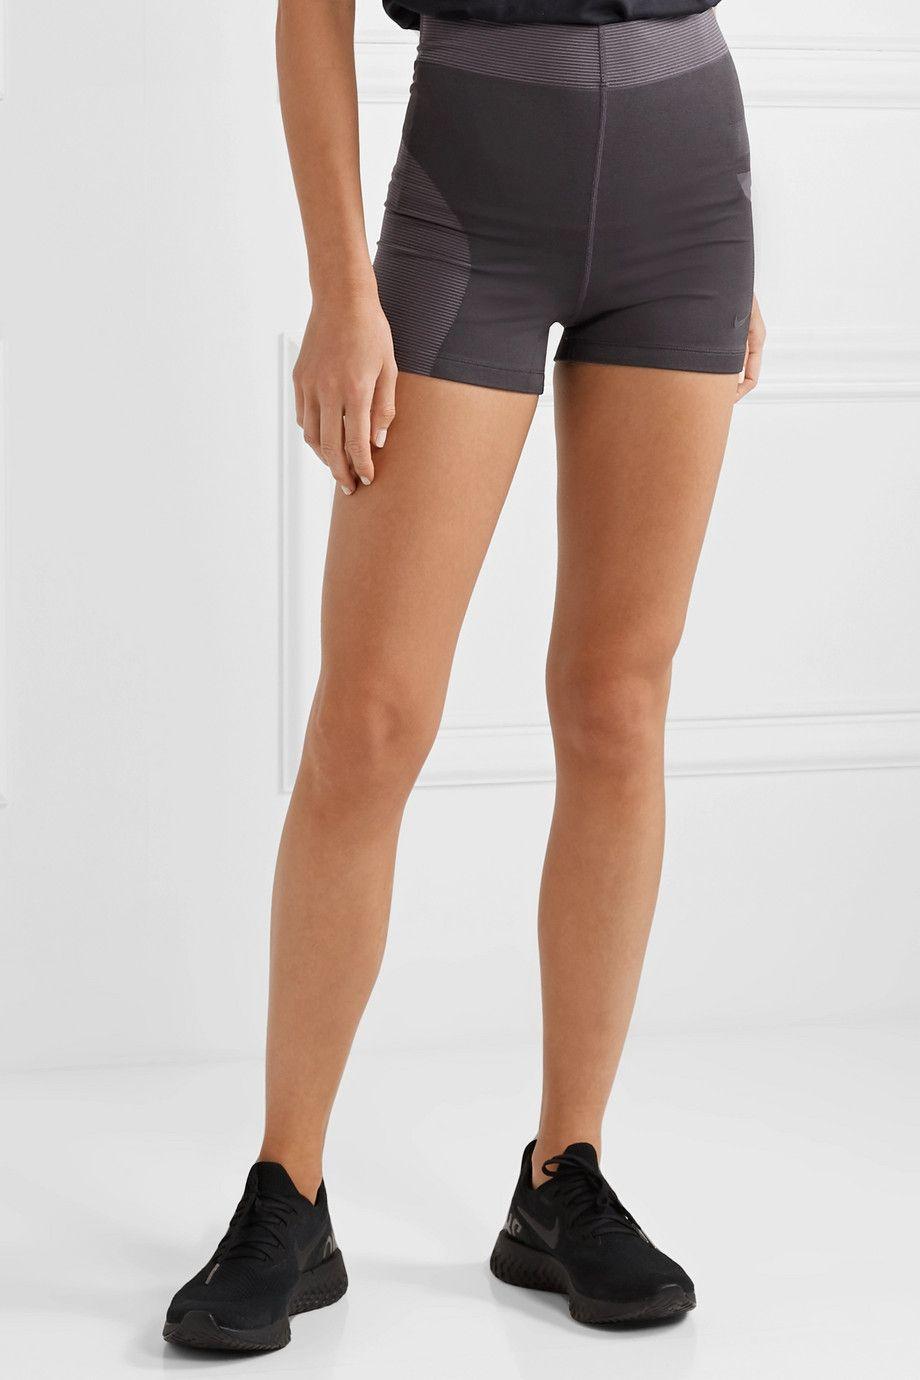 Nike Tech Pack HyperCool Stretch Shorts